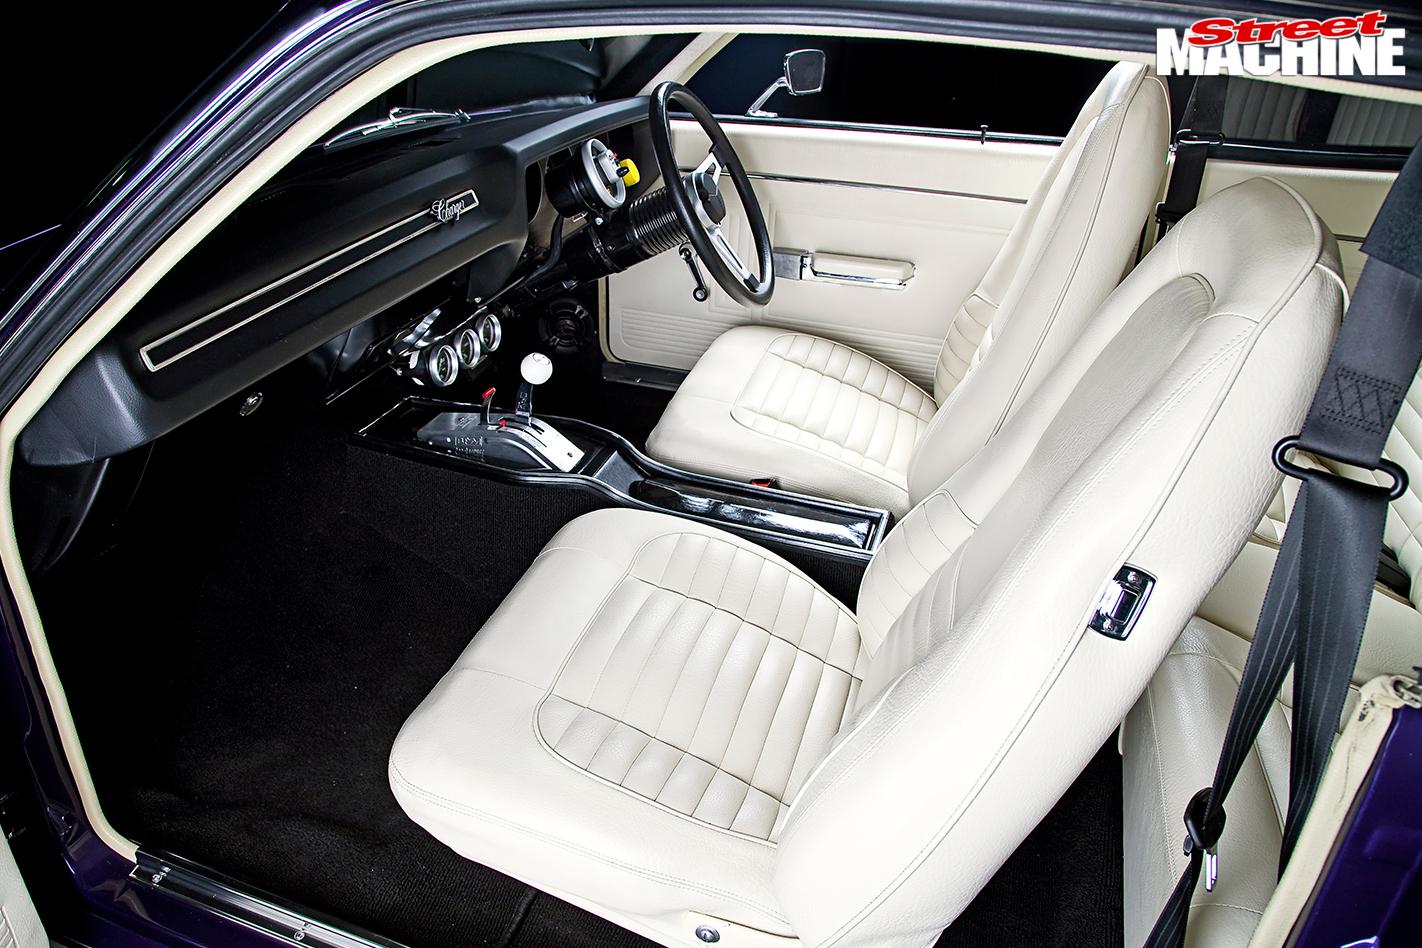 Chrysler -vk -valiant -charger -interior -front